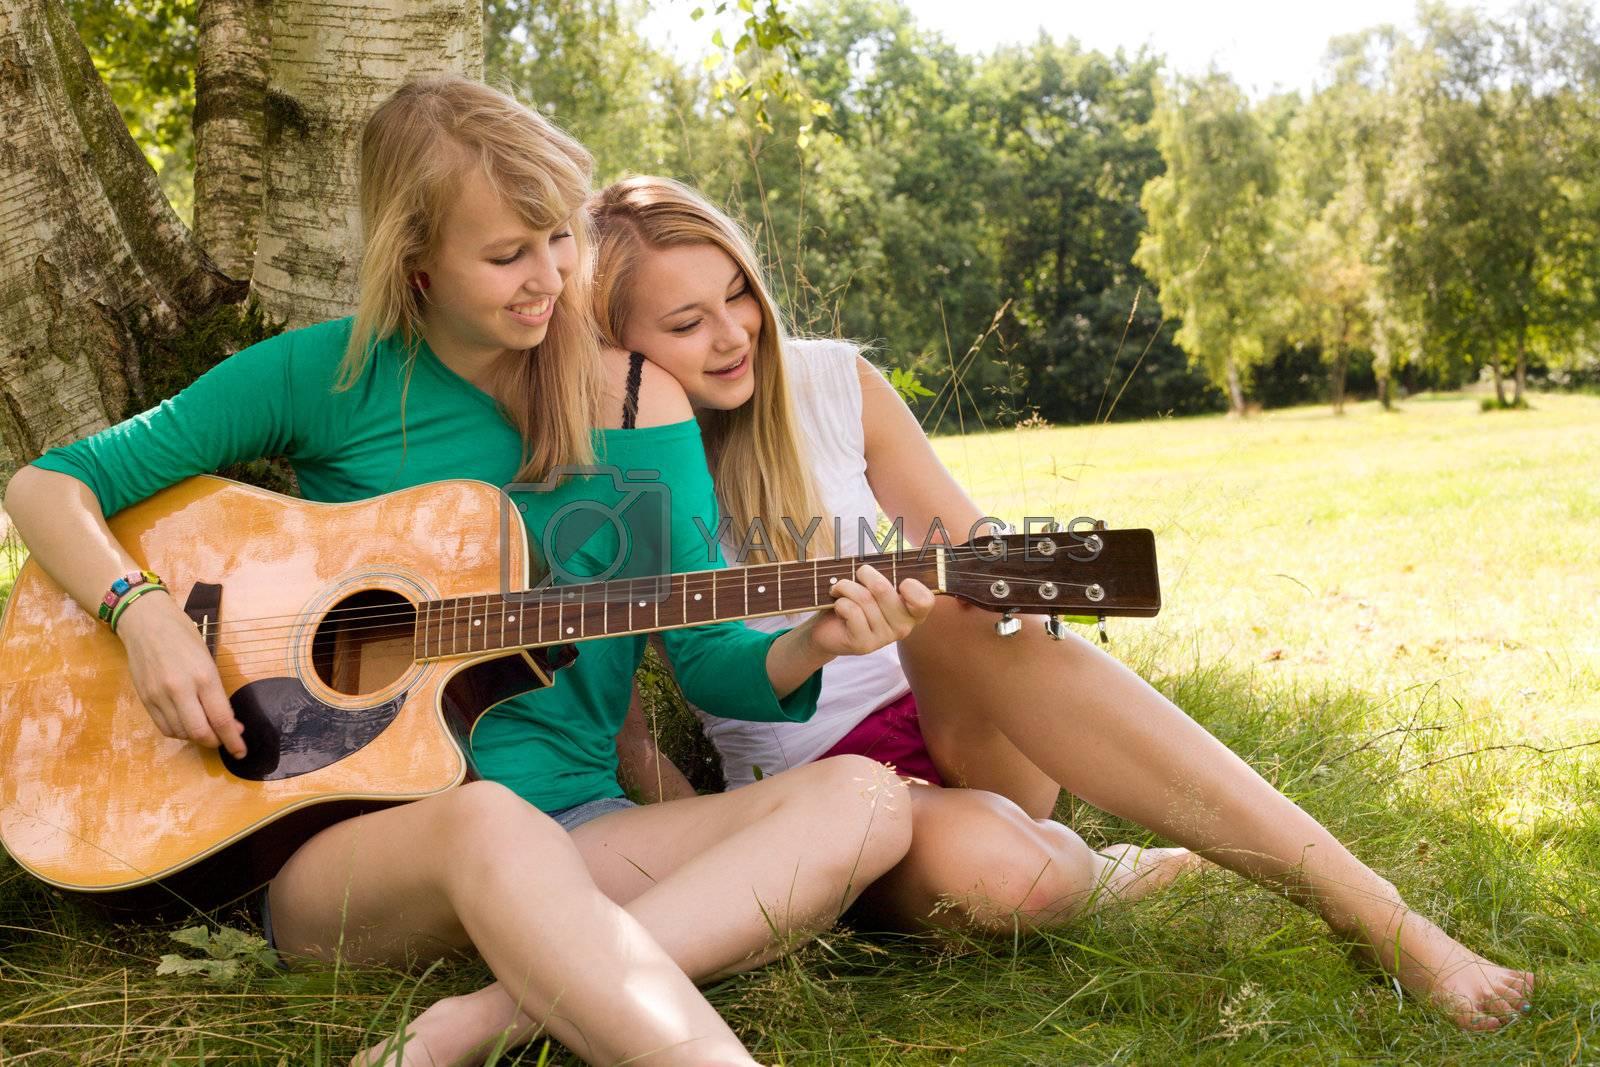 Two girls are having fun in the summer sun